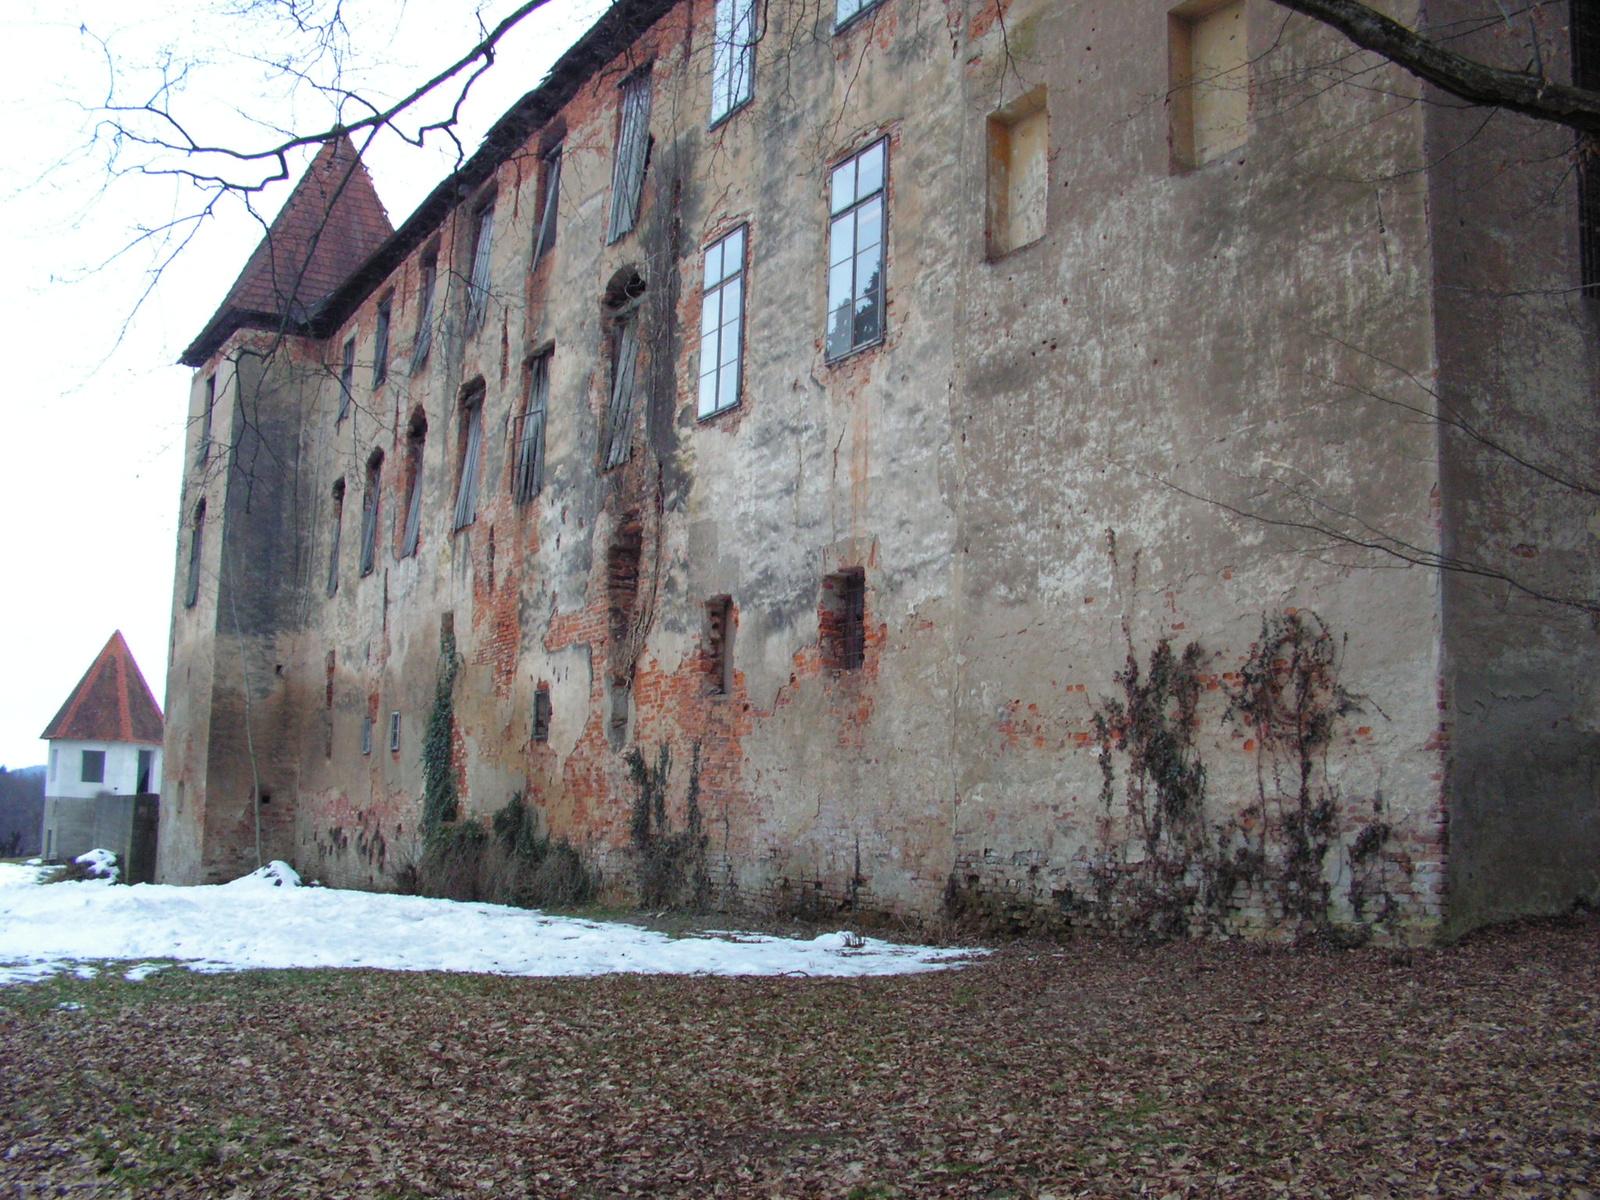 Ausztria, Kalsdorf bei Ilz, SzG3